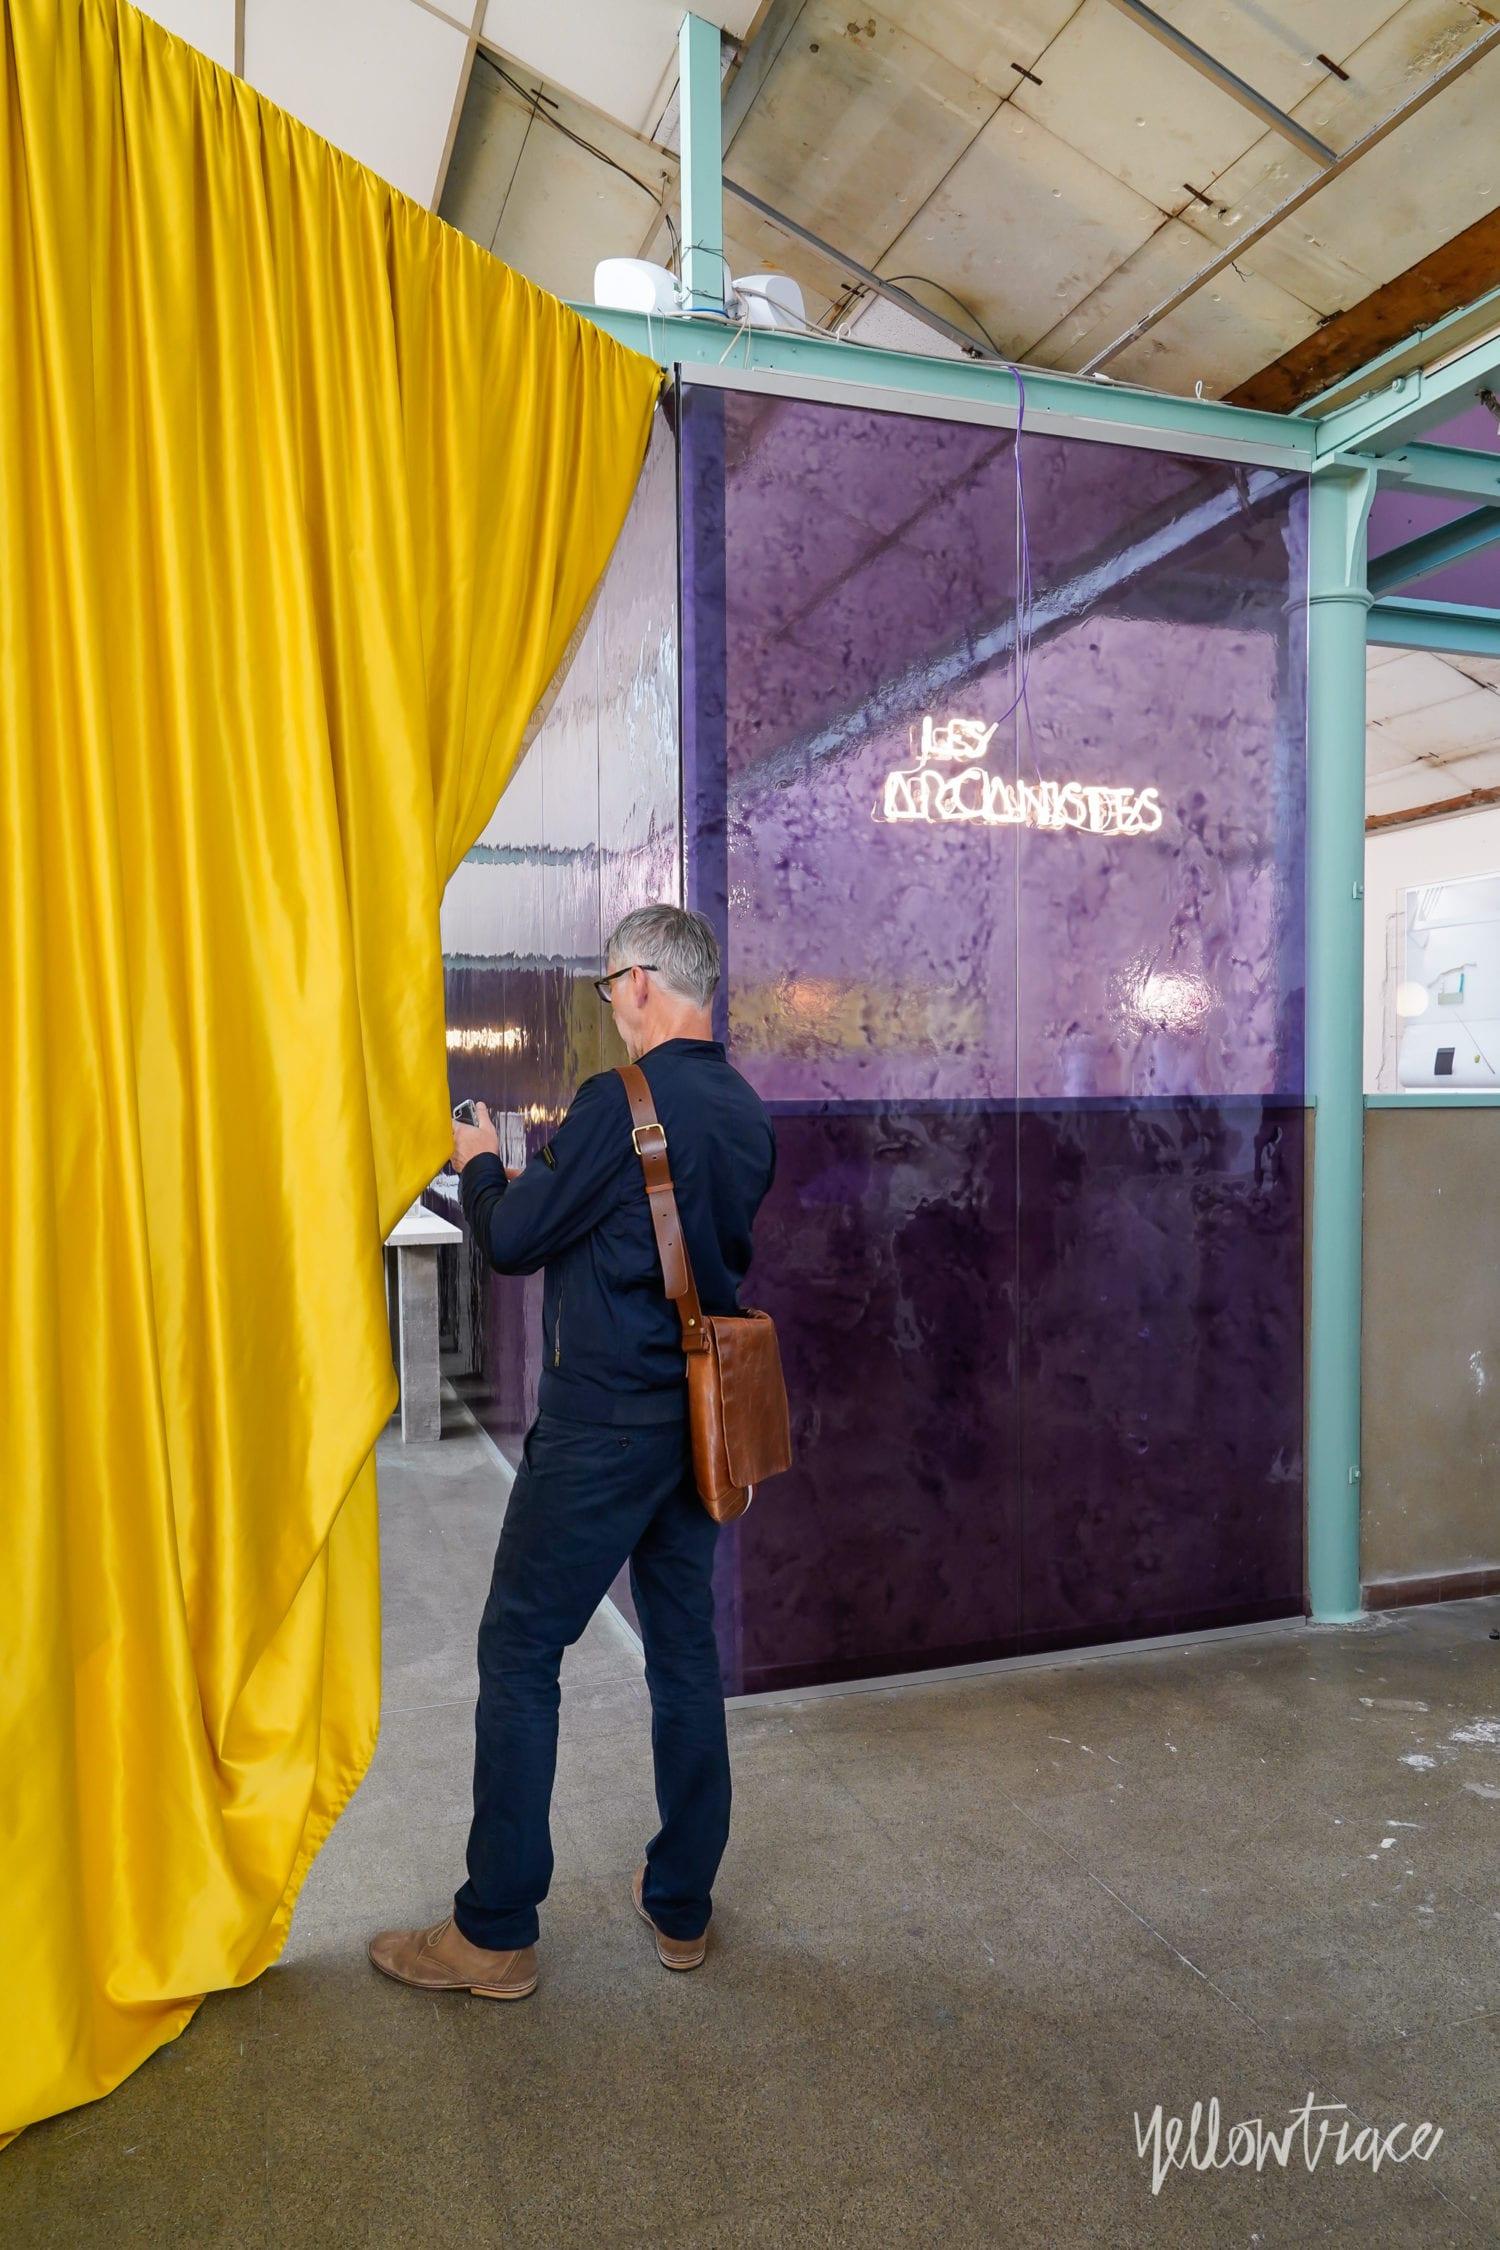 Les Arcanistes Studiopepe At Milan Design Week 2019 Photo Nick Hughes Yellowtrace 50c